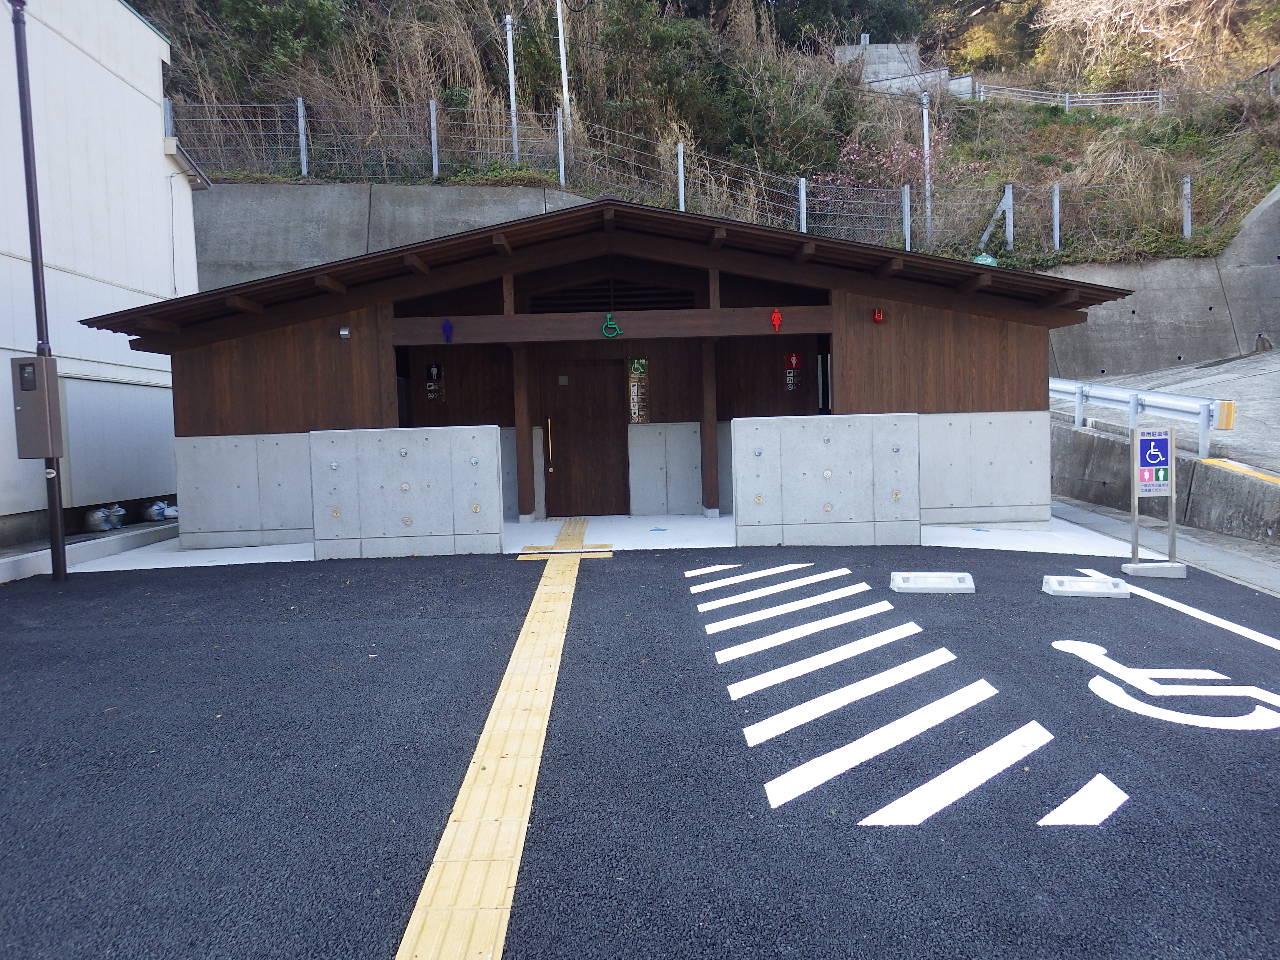 H29石廊崎地区観光トイレ建築工事